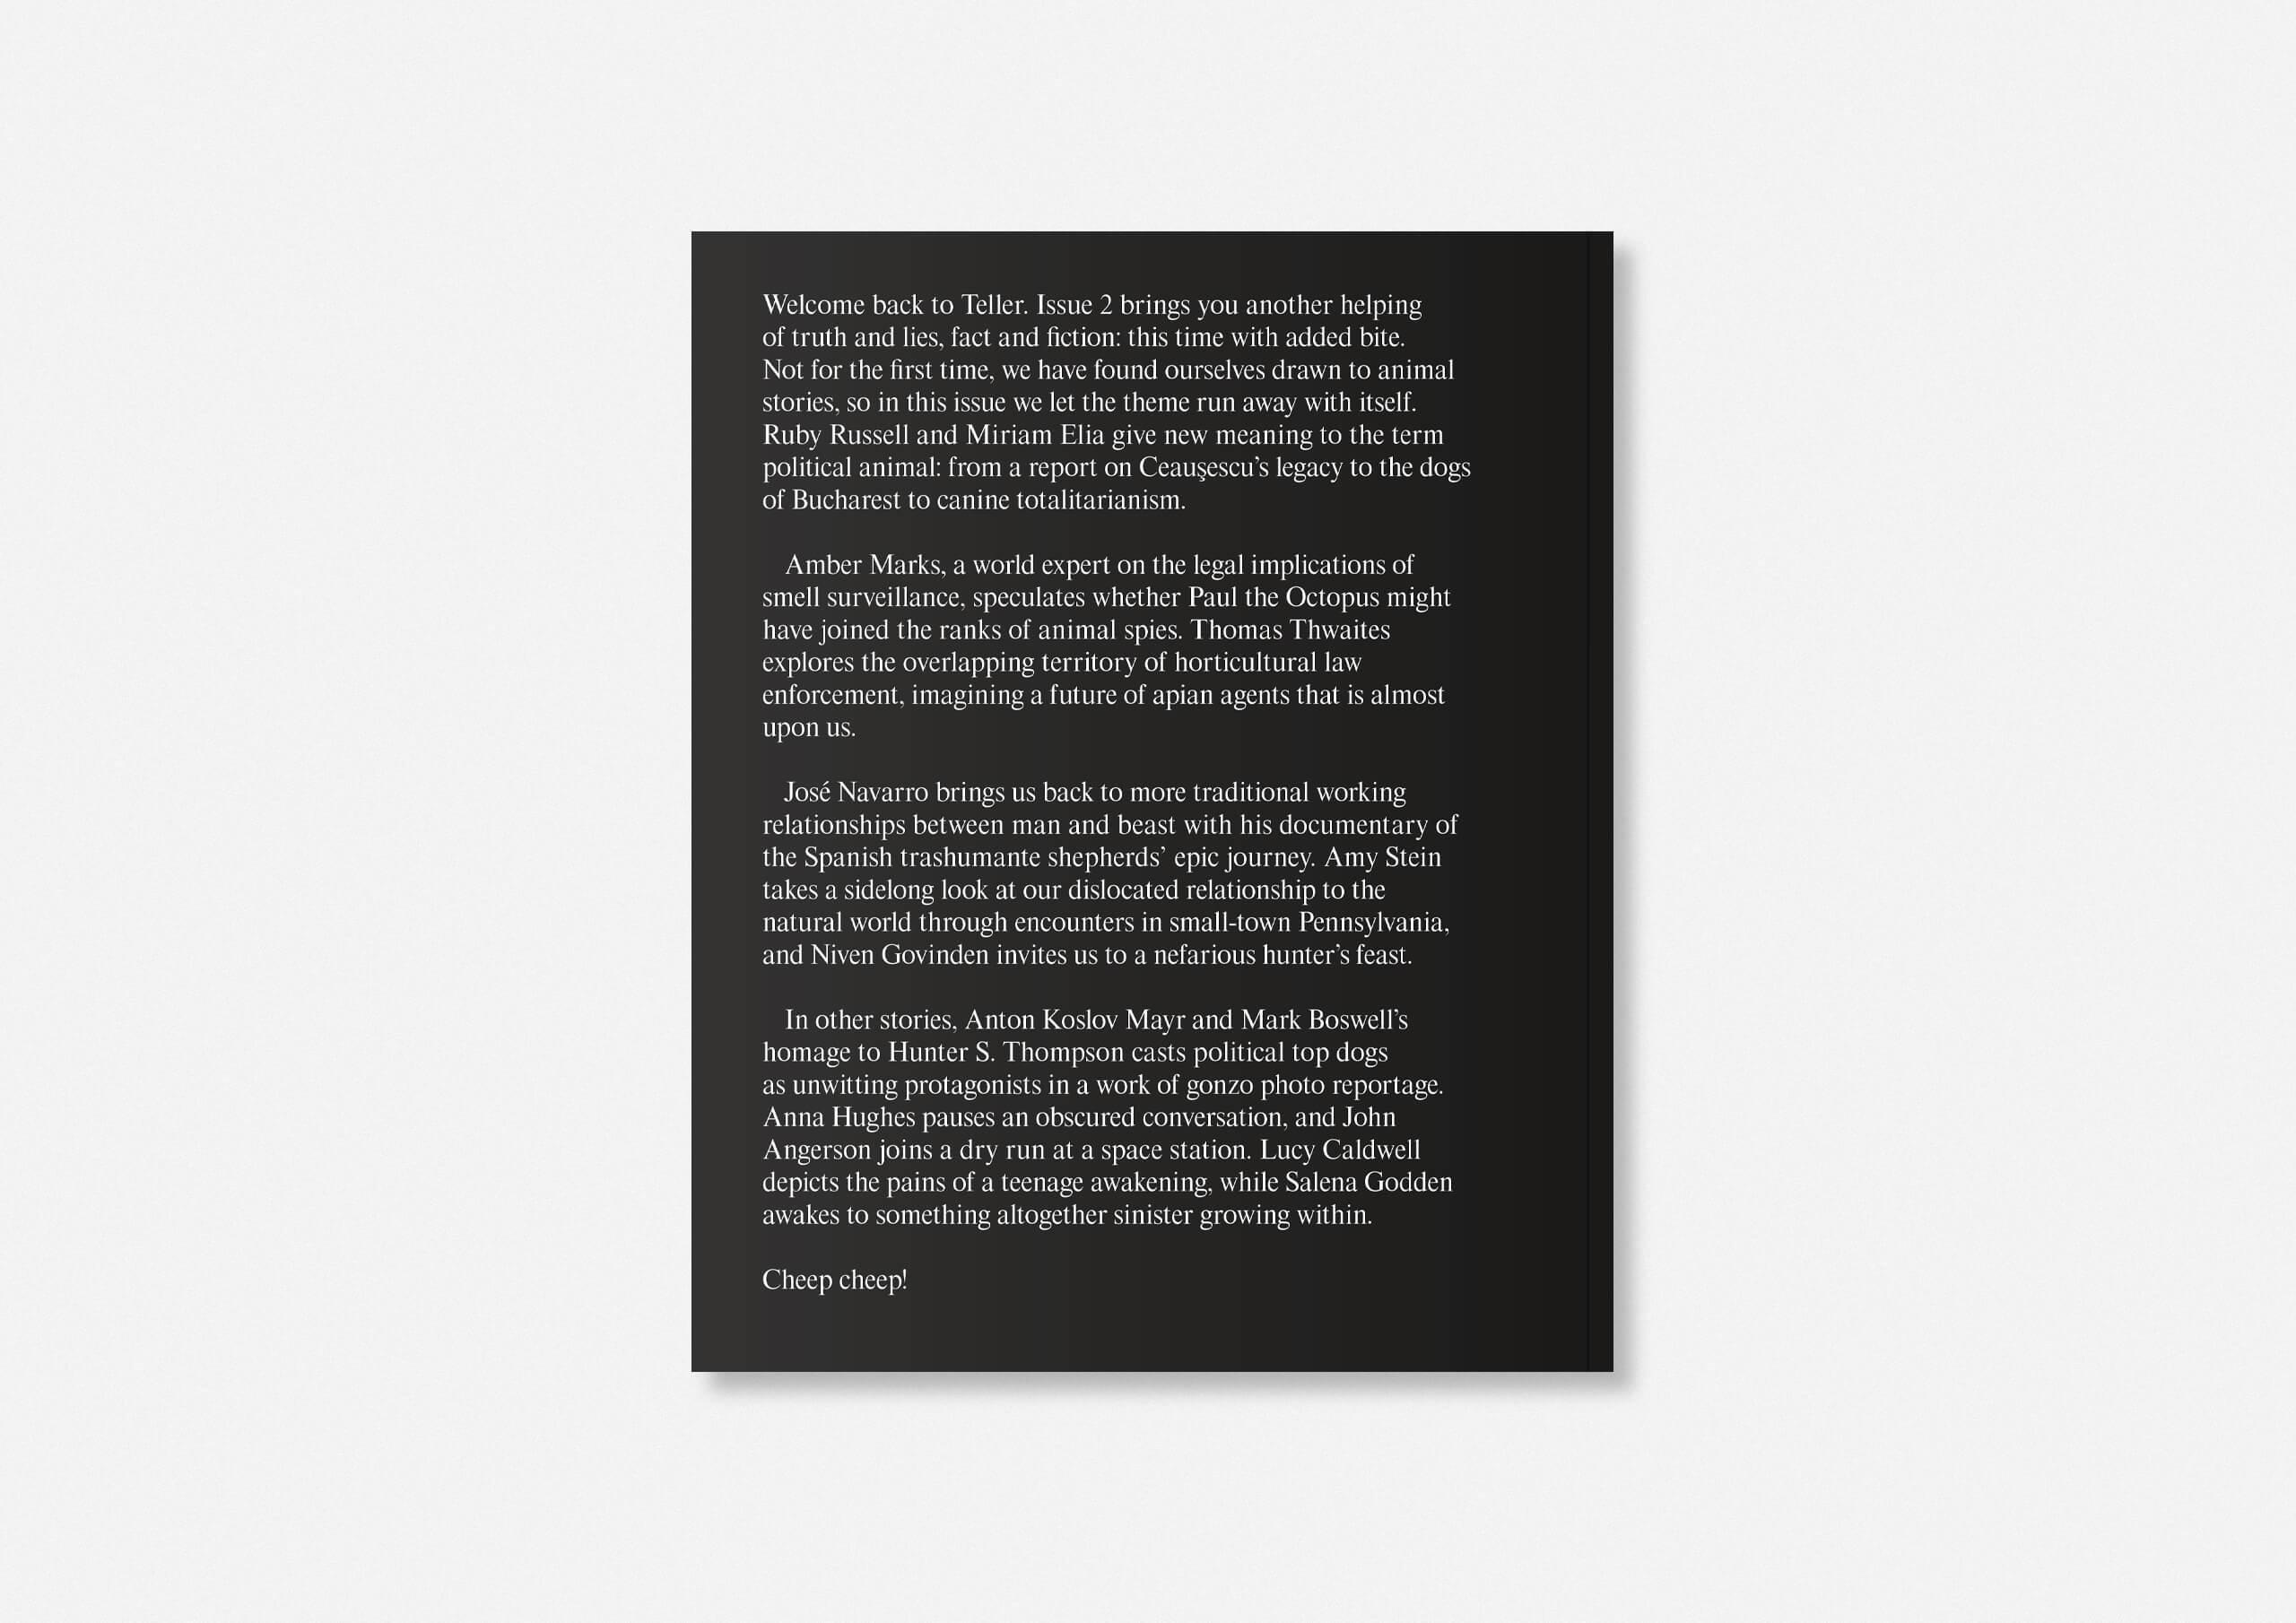 https://neuegestaltung.de/media/pages/clients/teller-magazine-issue-2/0239d6c8a9-1597415081/teller_issue_02_ruckseite_ng.jpg